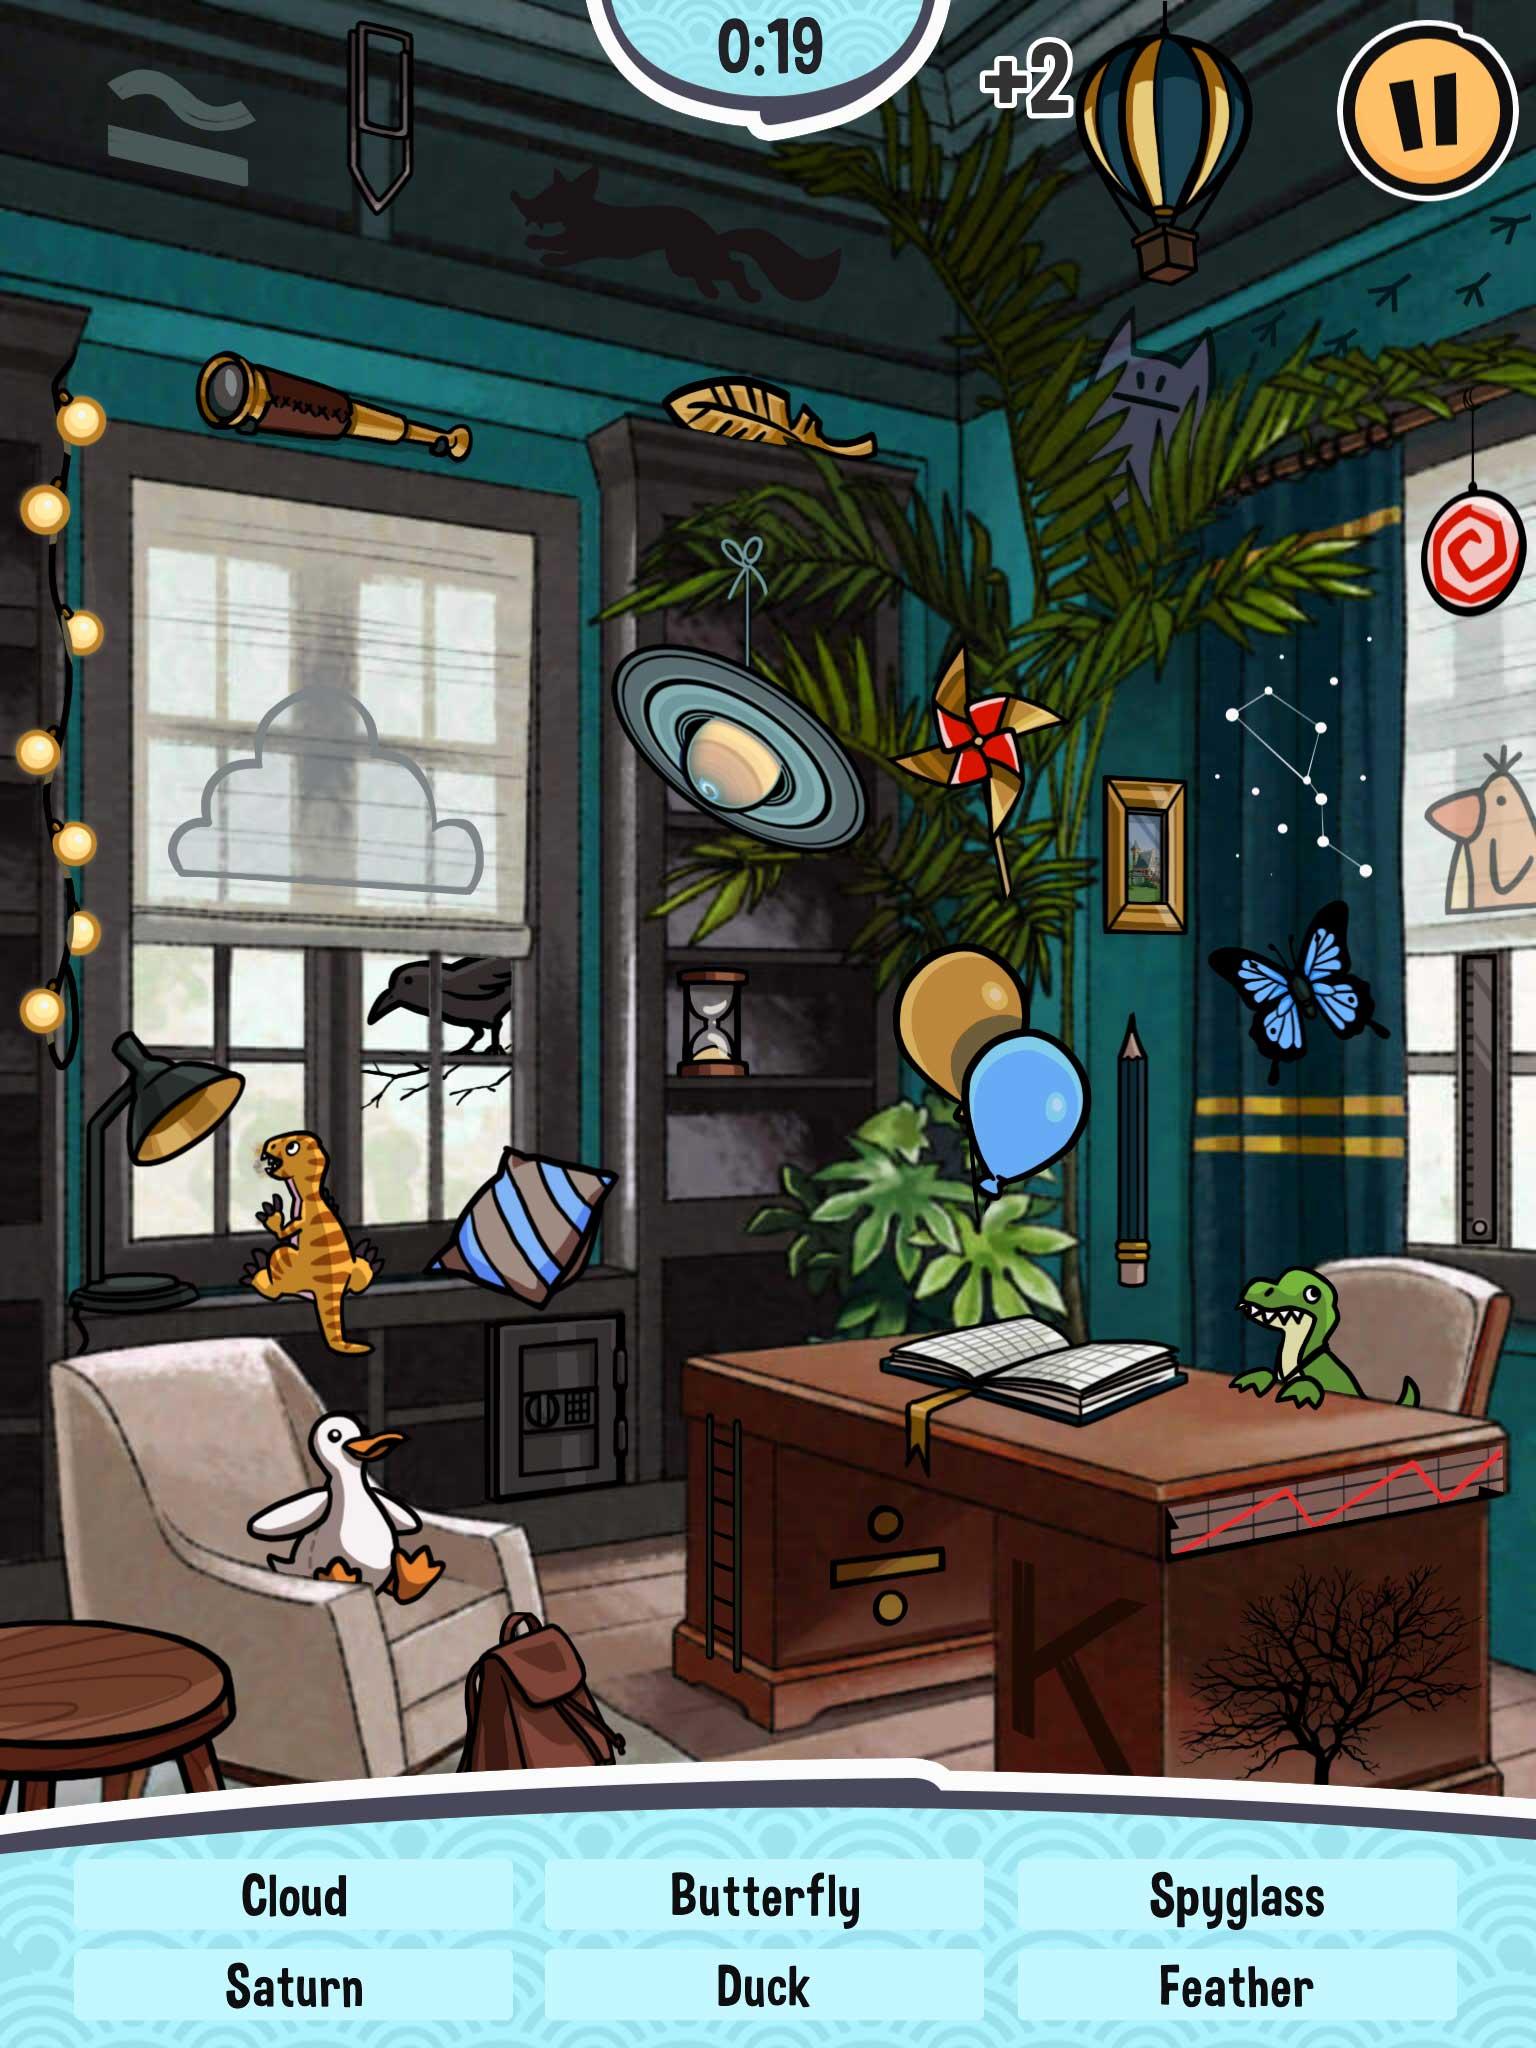 images/games/pingouin/Screenshot_Tablet_03.jpg